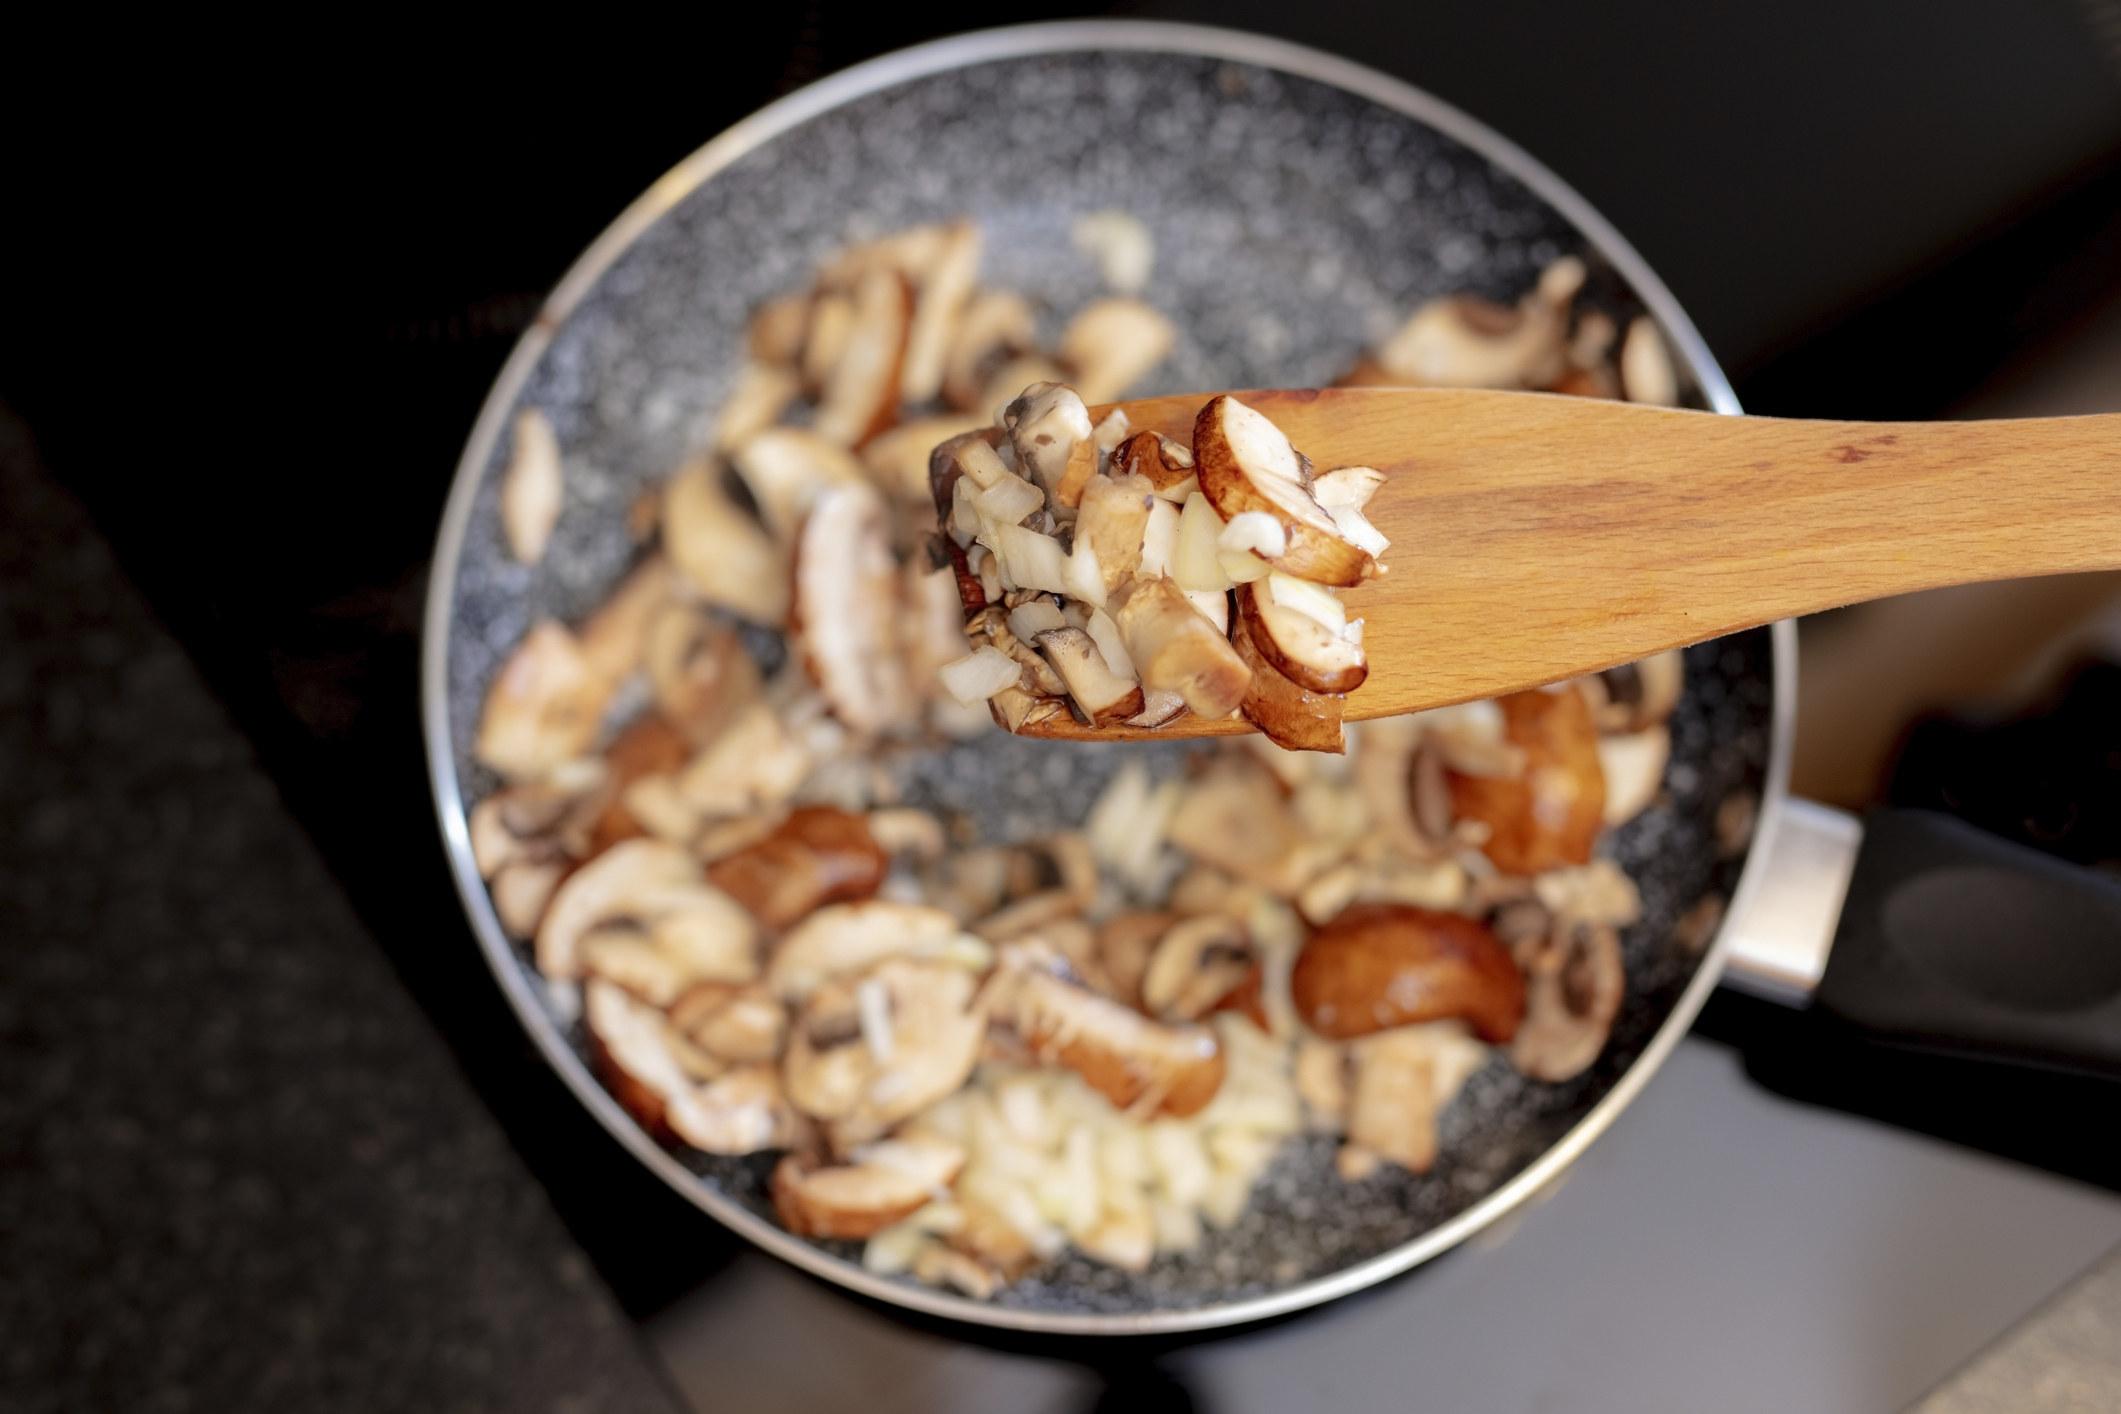 Stirring mushrooms in a sauté pan.